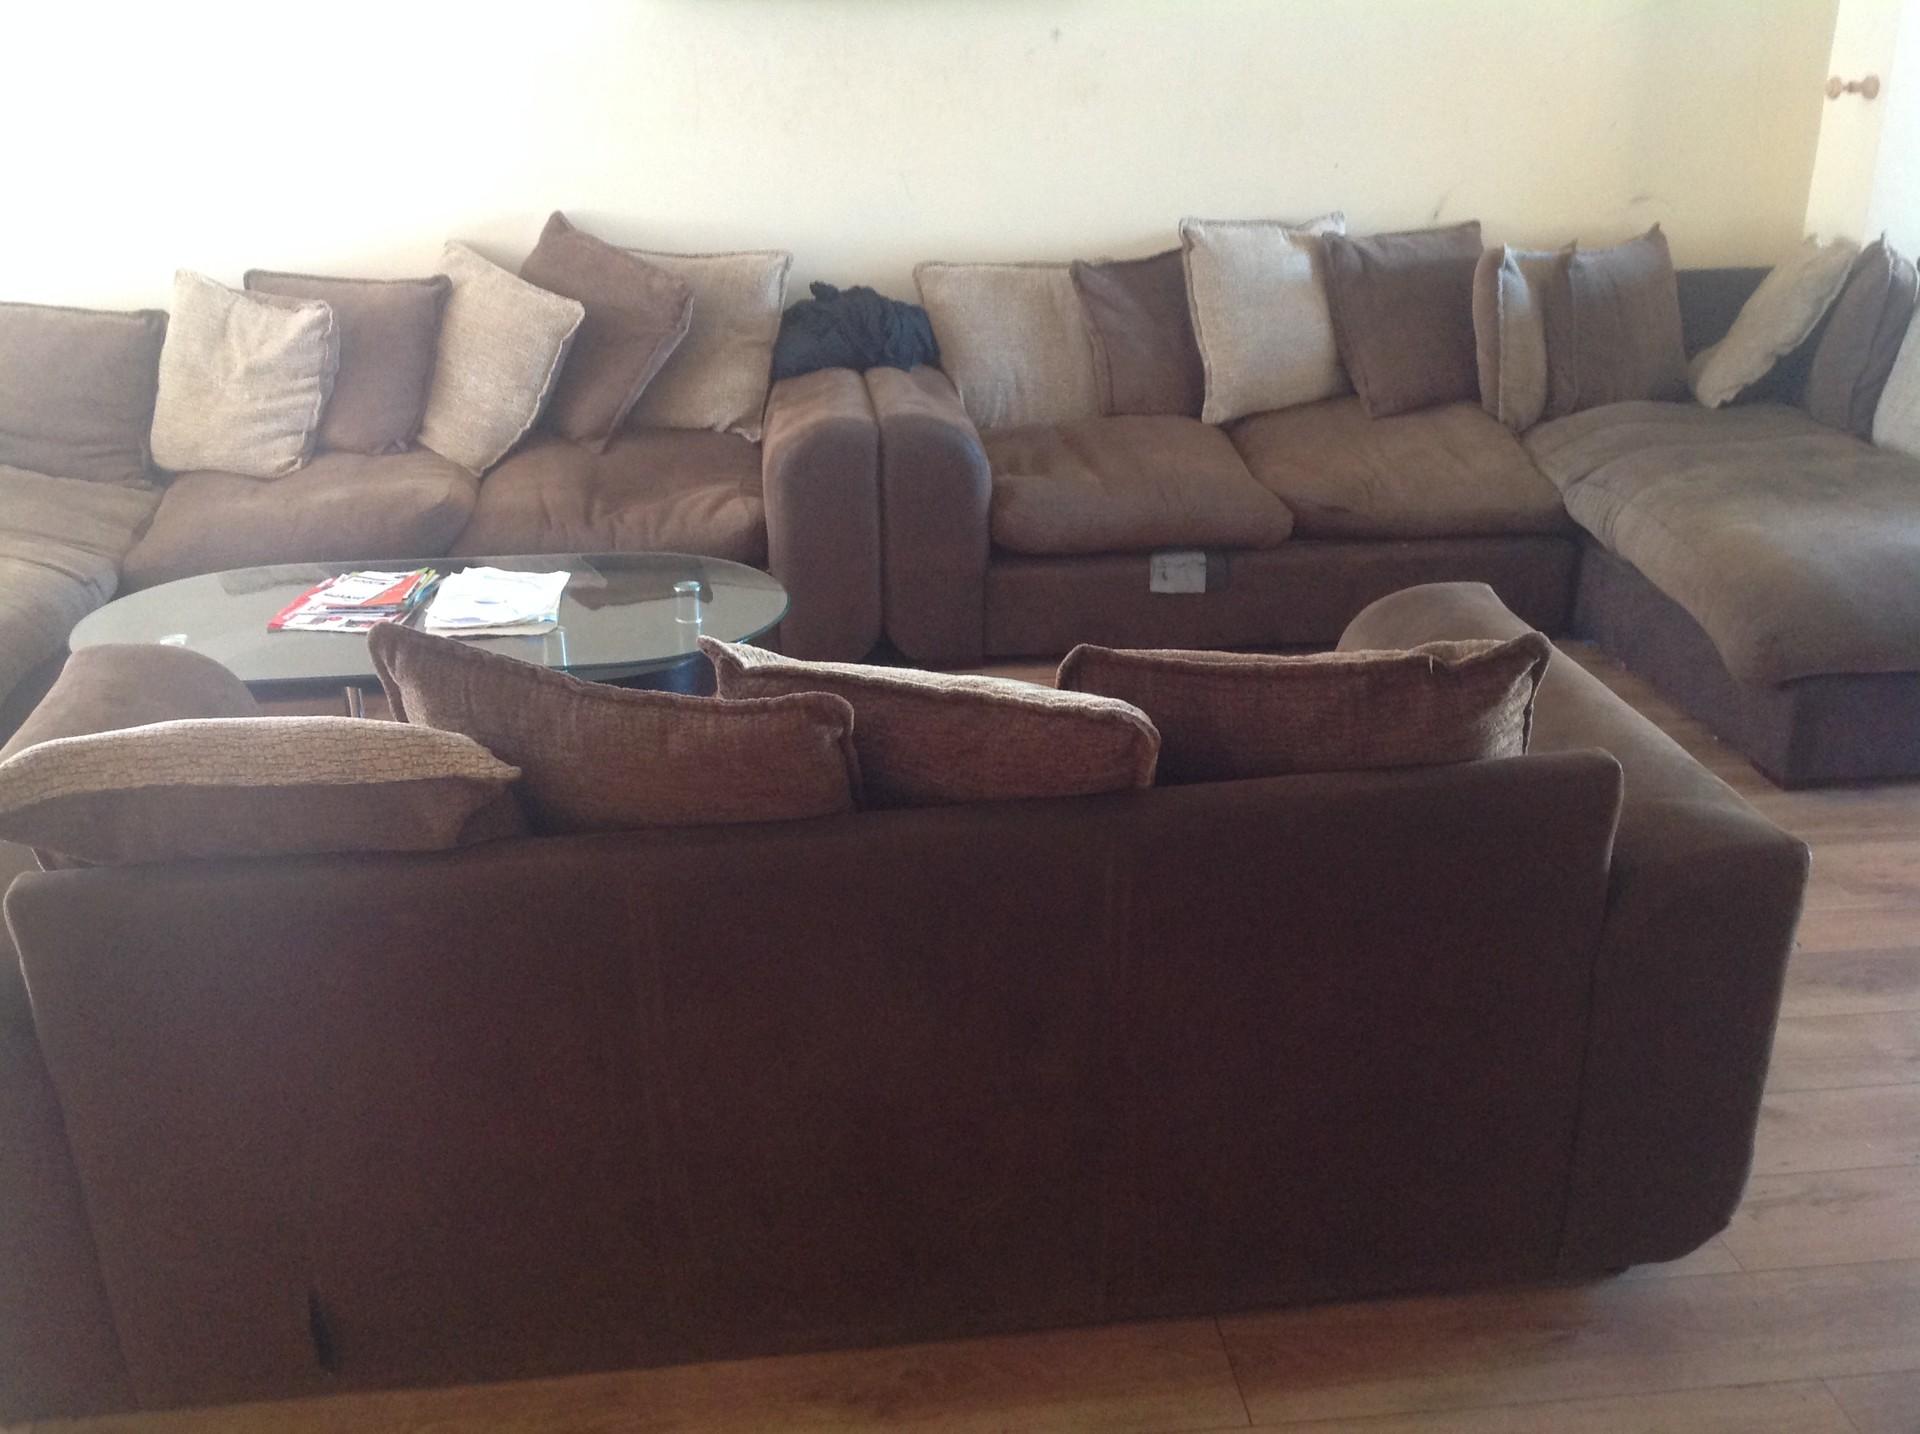 spacious-furnished-double-room-shared-ho